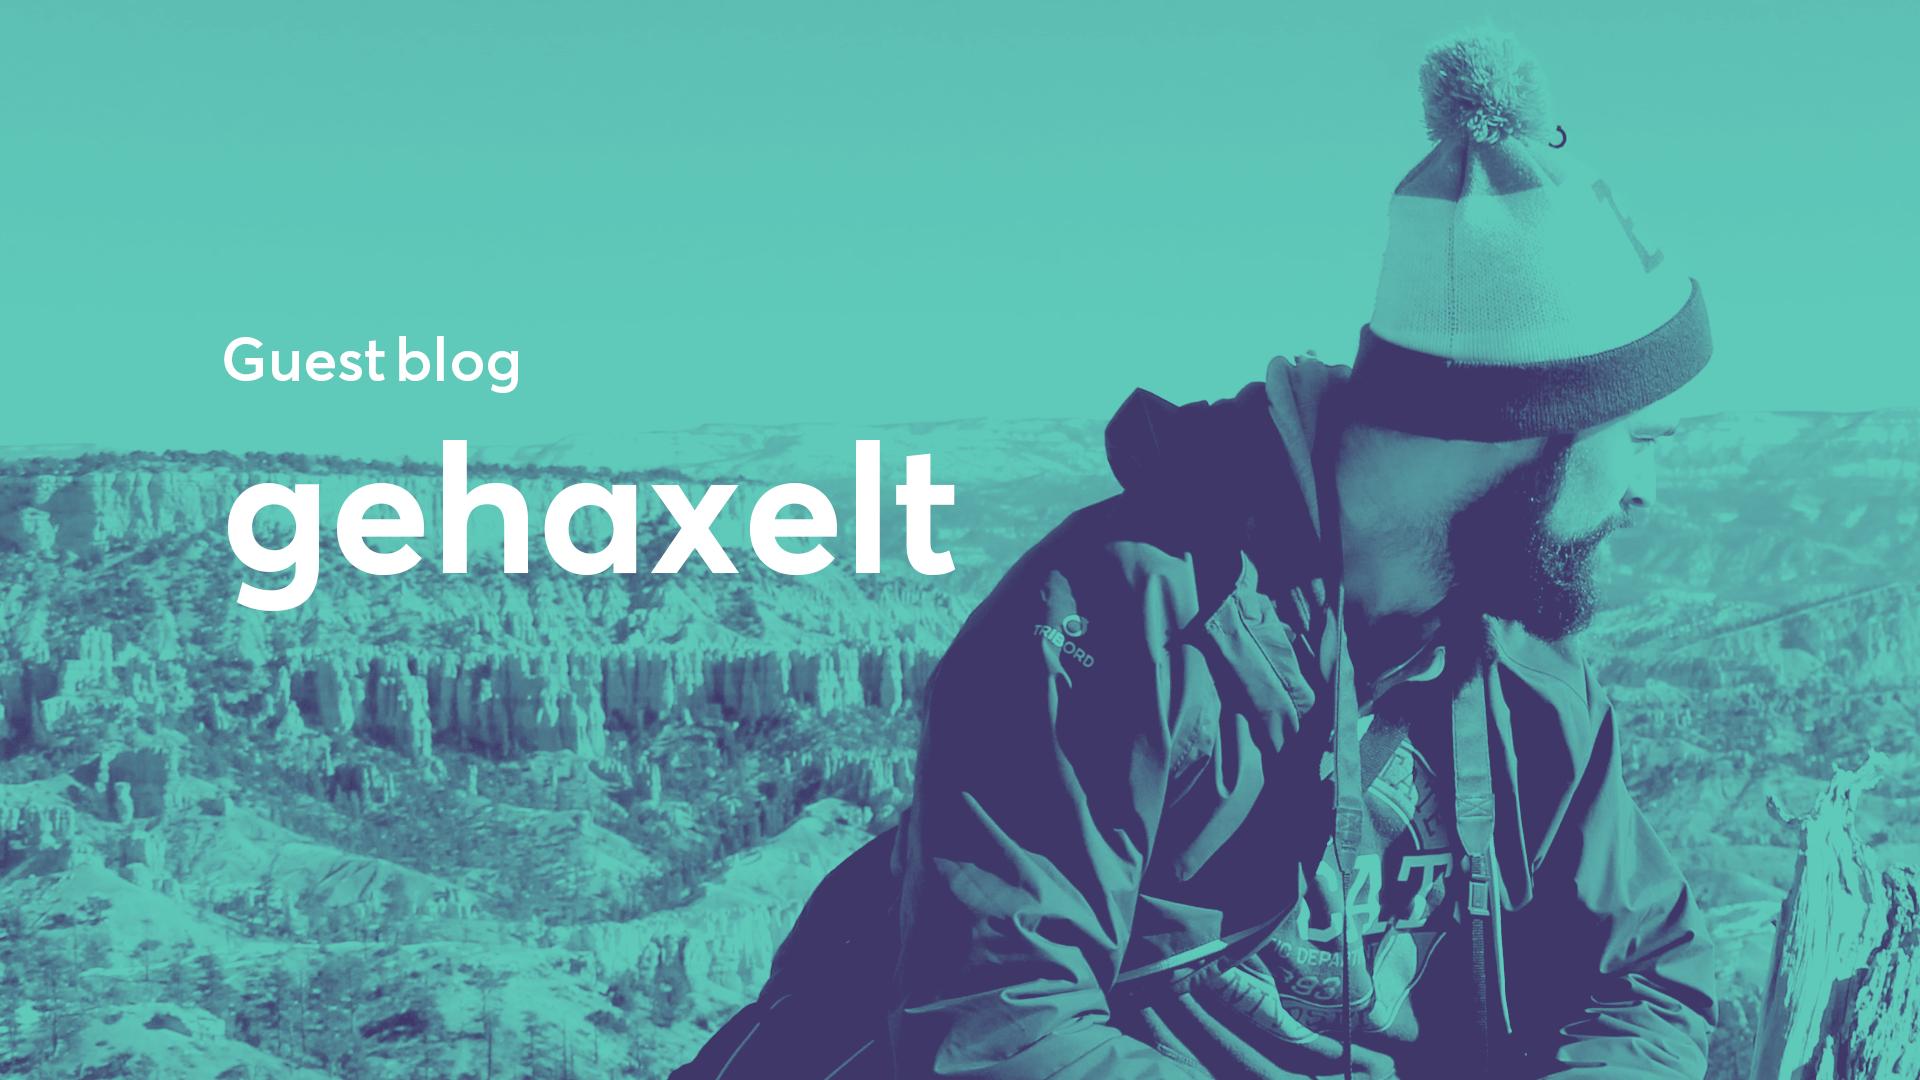 Gehaxelt How Wordpress Plugins Leak Sensitive